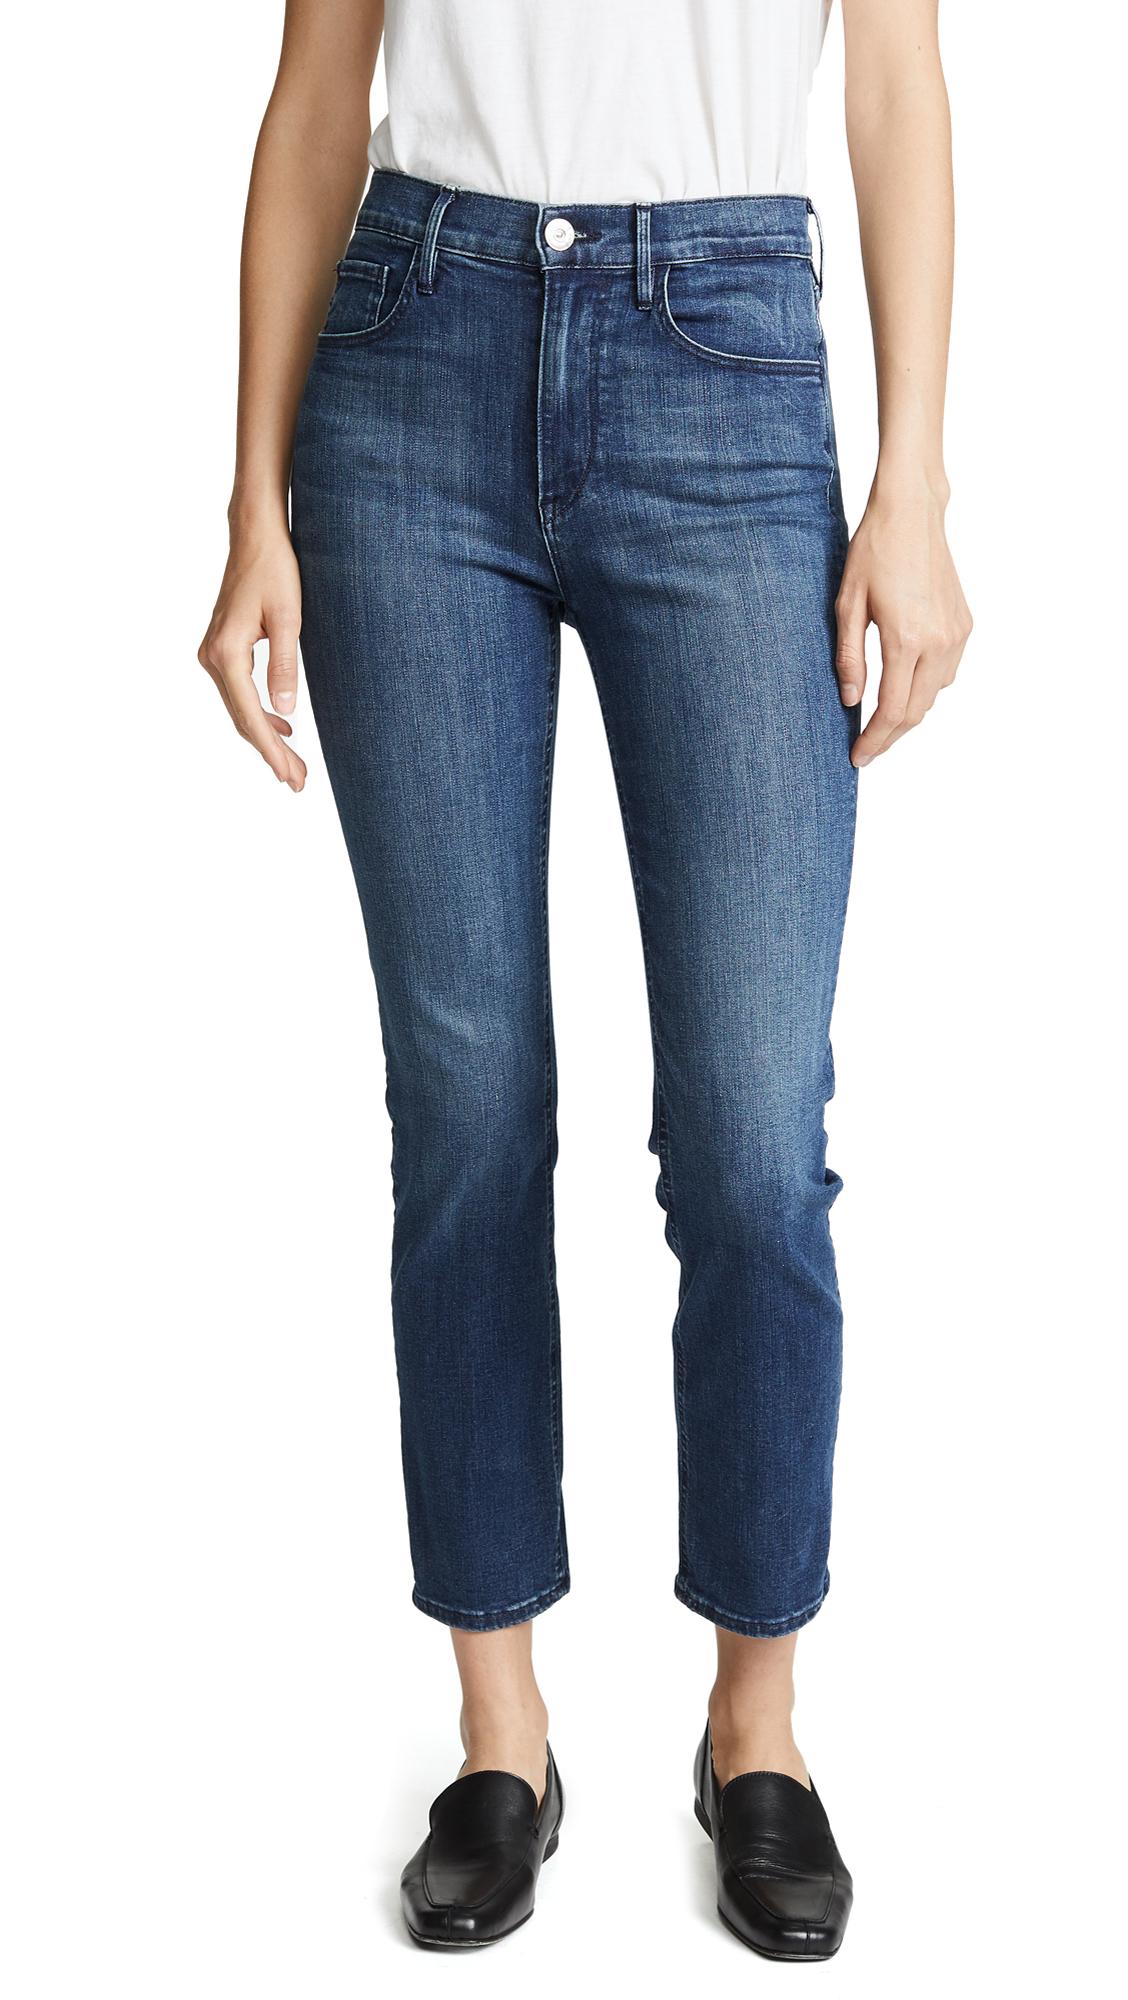 3x1 W4 Colette Slim Crop Jeans - Odette